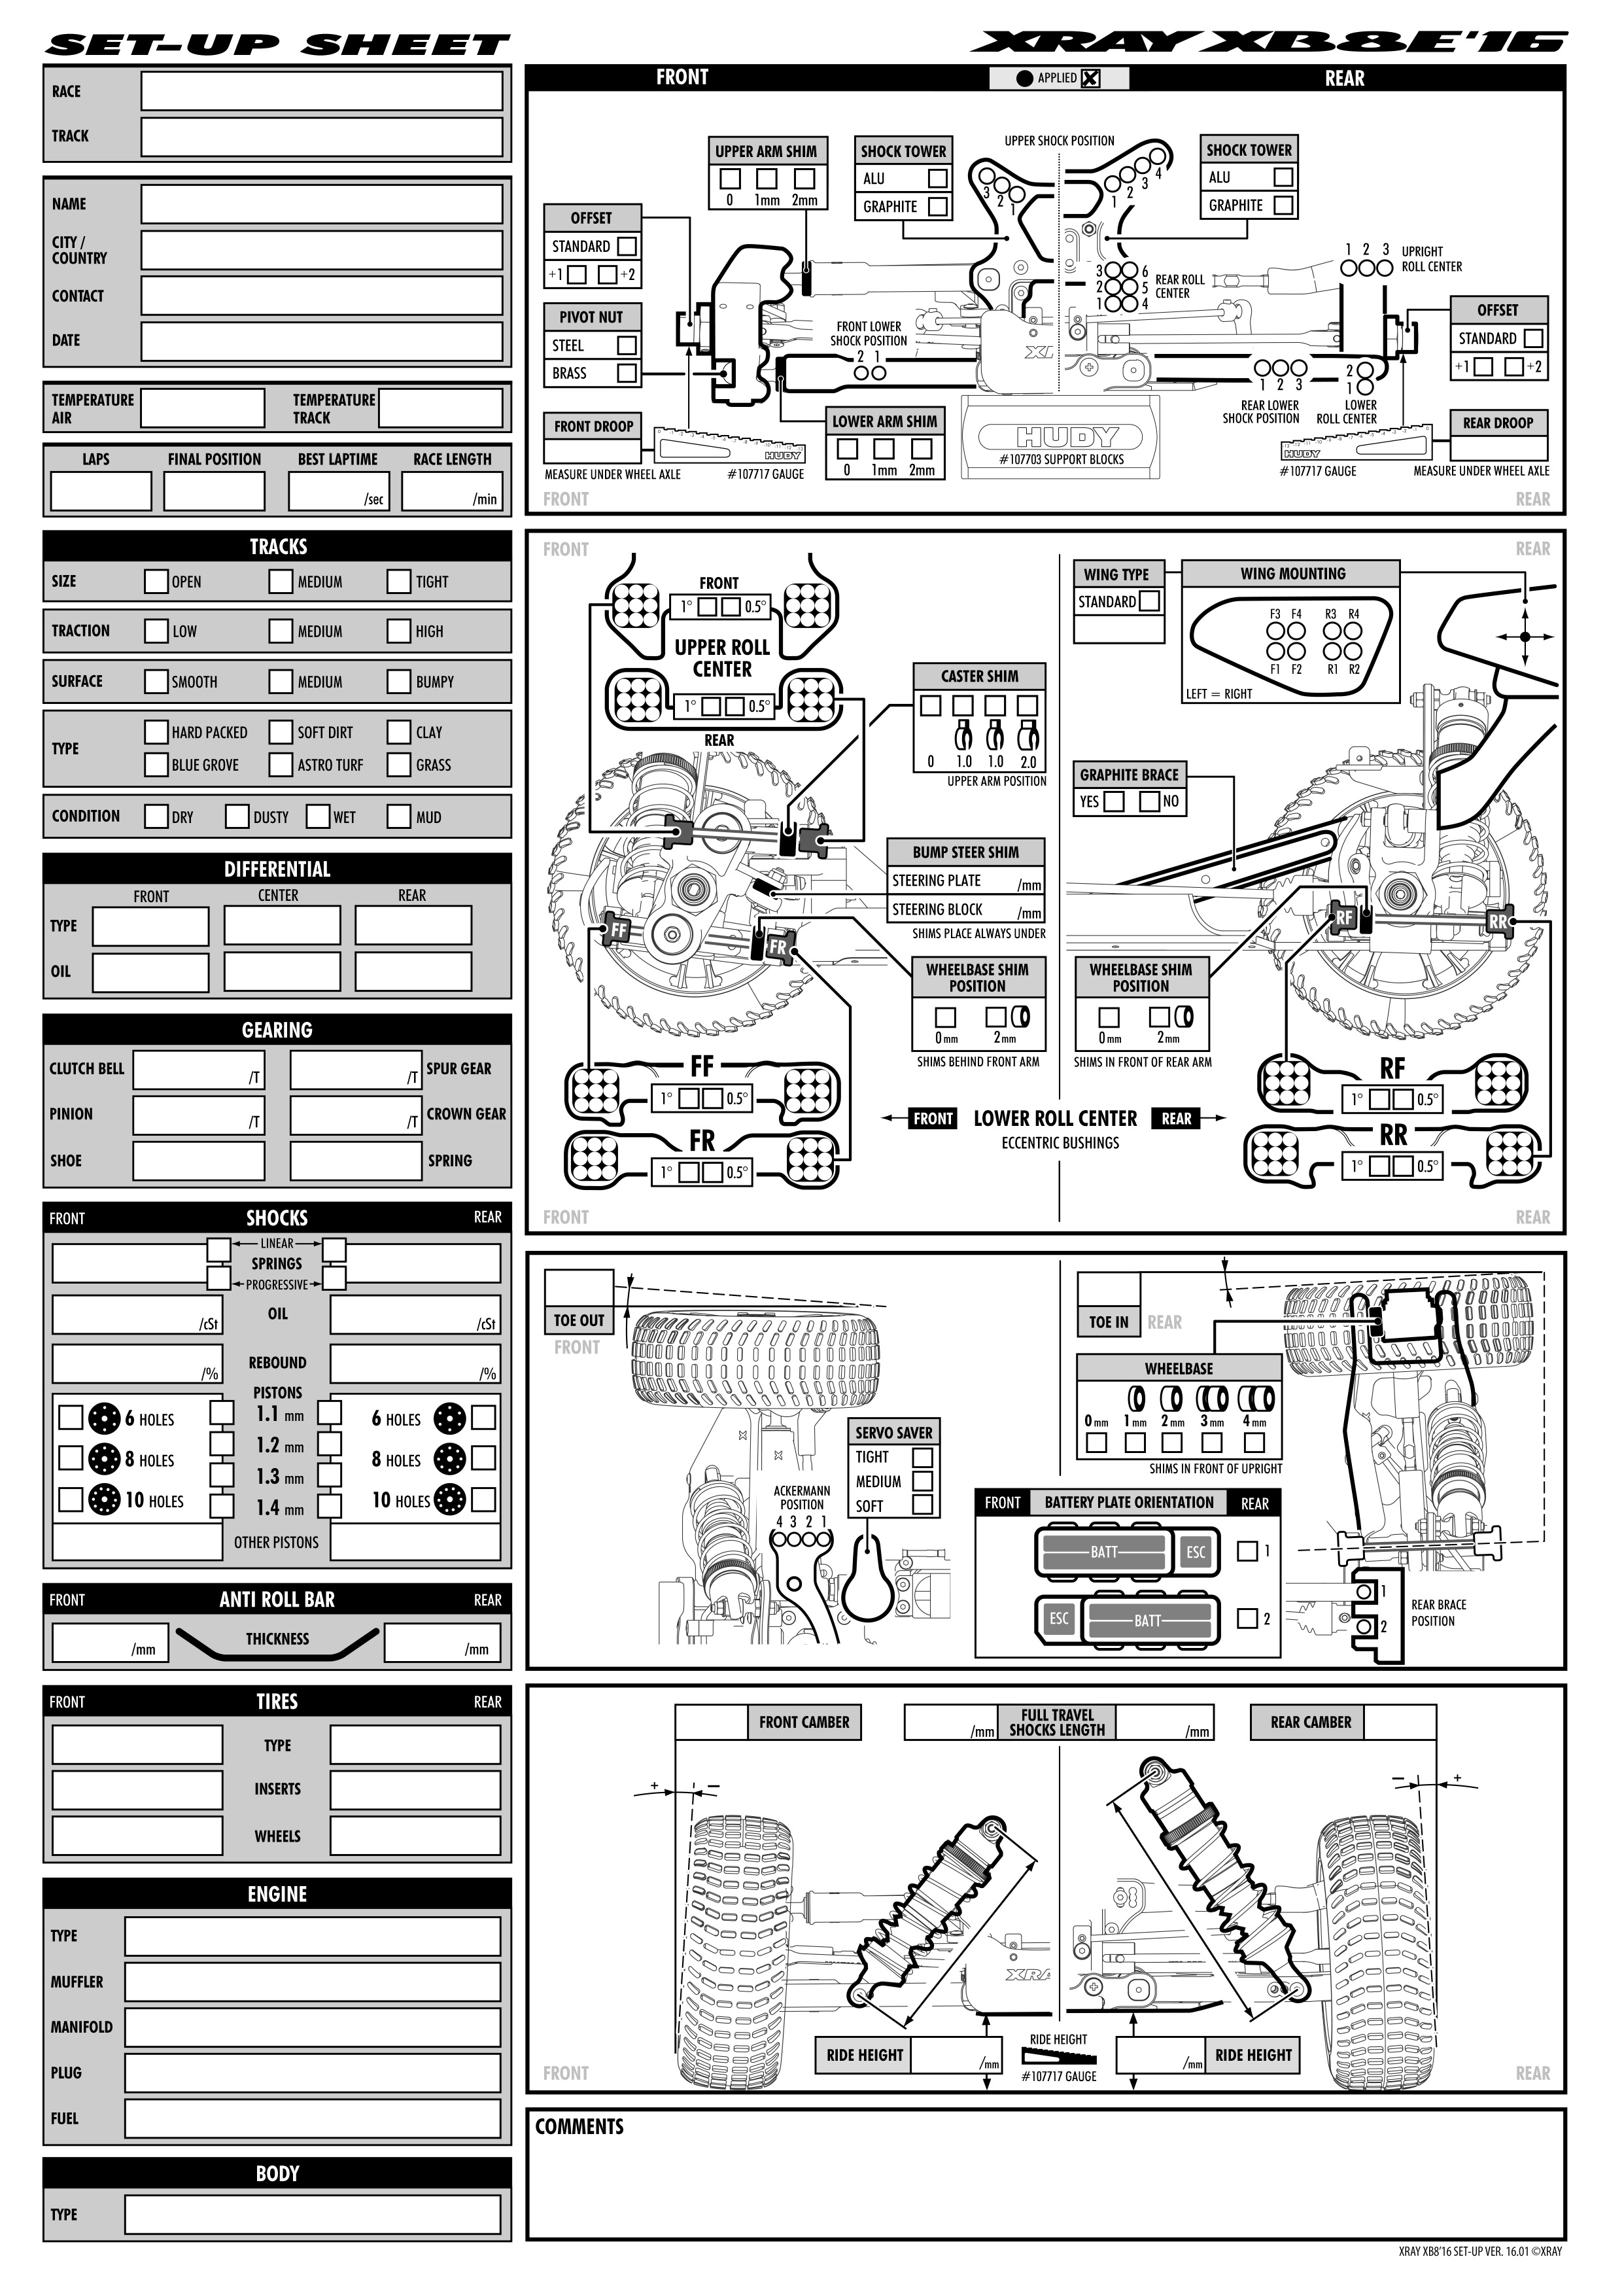 nitro car kit with Download on Pantalla De Cabecera Tview T725pl 7 Pulgadas 2 Pzas Monitor besides Team Associated B6 Team Kit Buggy Rc likewise Take A Walk Down Memory Lane With This Custom Bmw E39 M5 Photo Gallery 55583 besides 251248926533 as well 55457 Tamiya Maquette Moto 14131 Kawasaki Ninja H2r 112.